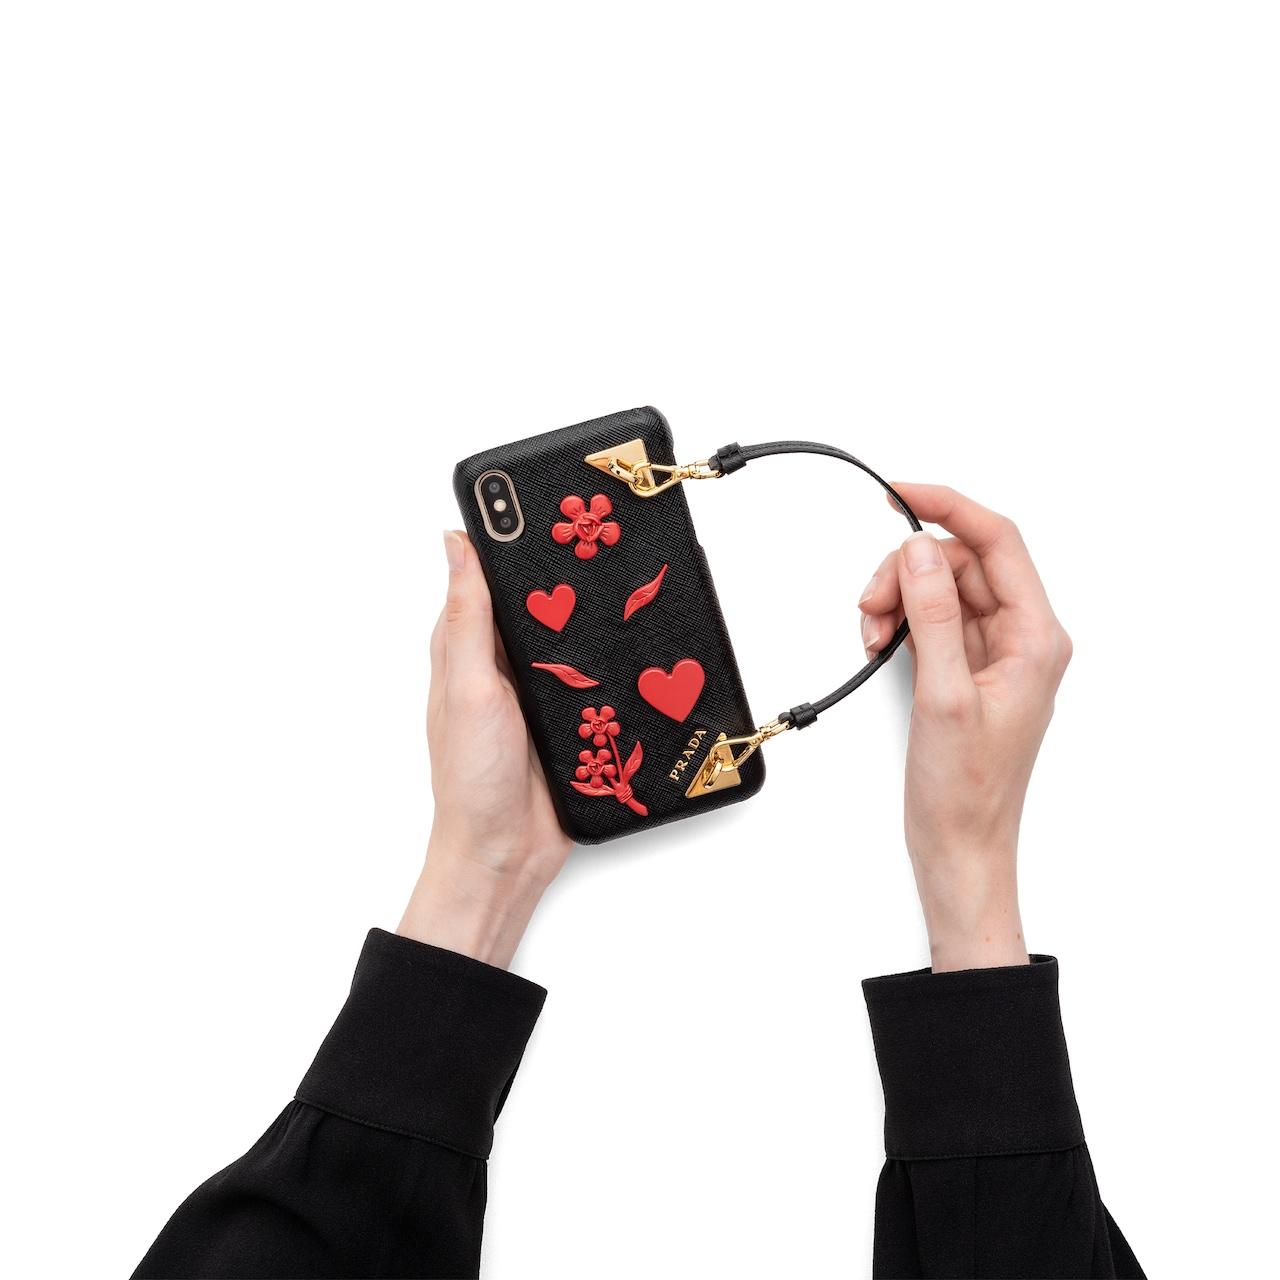 Prada Saffiano 皮革iPhone XS MAX 手机套 2